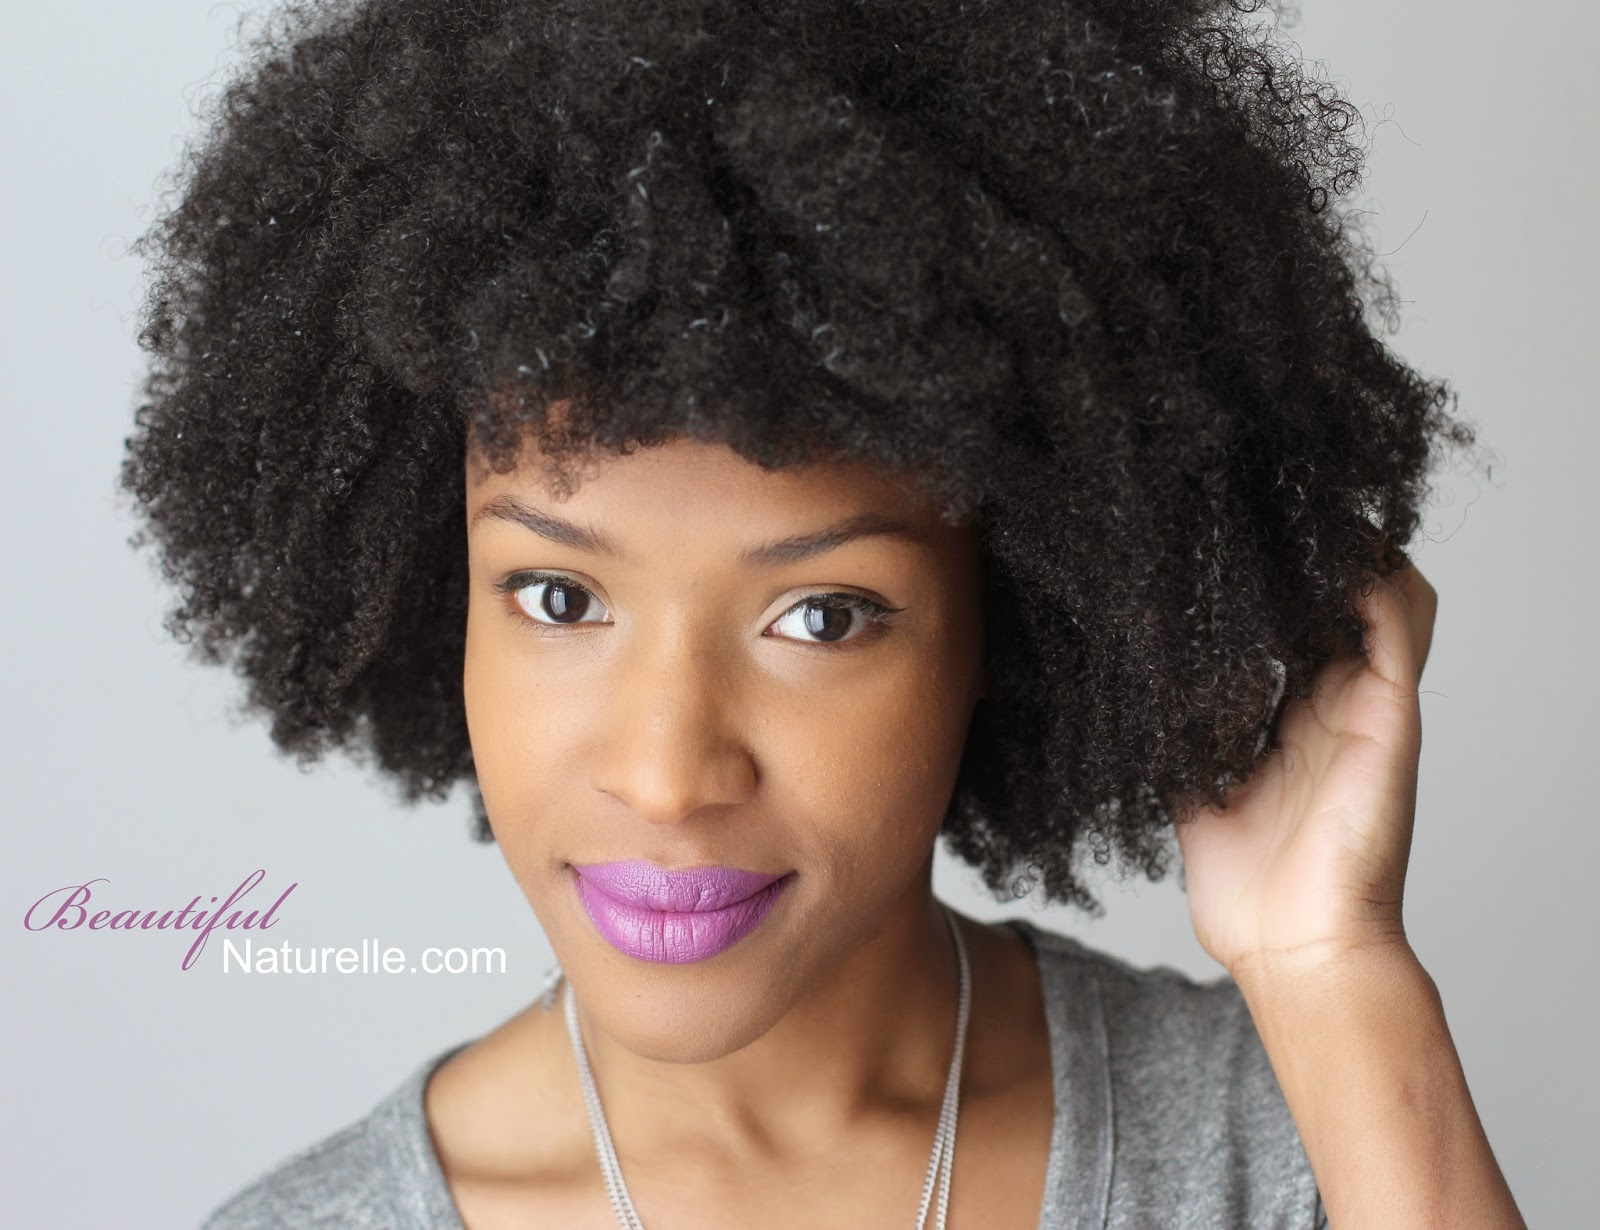 summer style l 39 afro parfait wash and go sans gel et maquillage l ger d 39 t beautiful. Black Bedroom Furniture Sets. Home Design Ideas